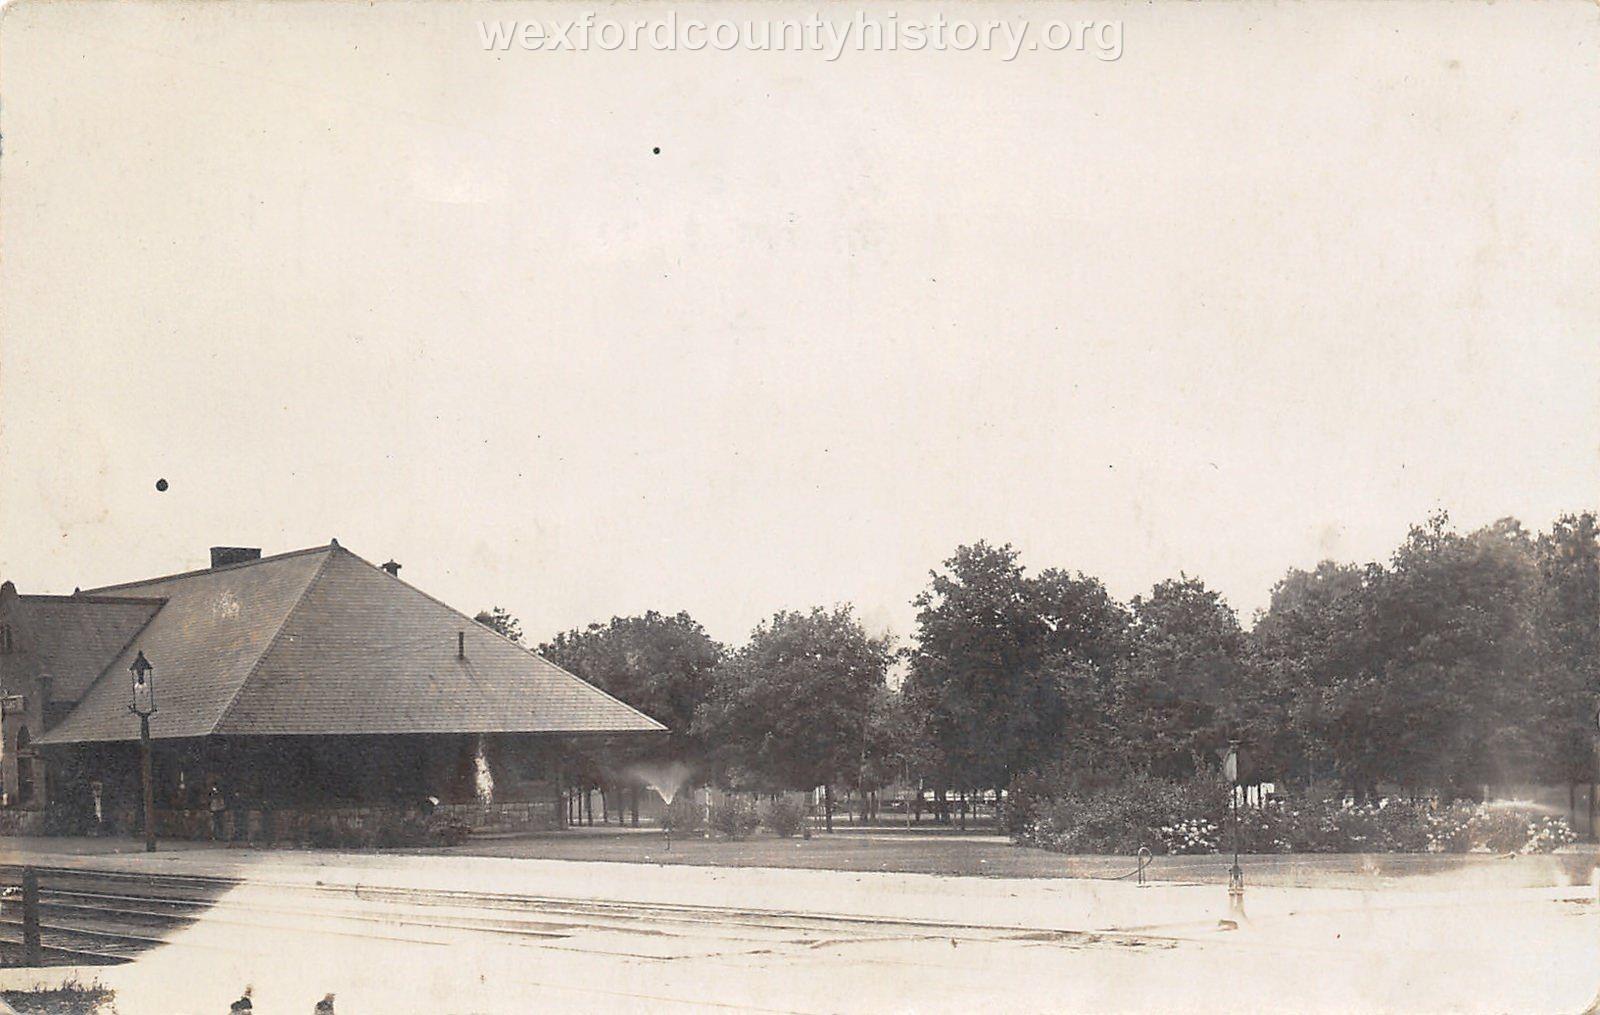 Cadillac-Railroad-Grand-Rapids-And-Indiana-Railroad-Depot-Pennsylvania-Railroad-Depot-37